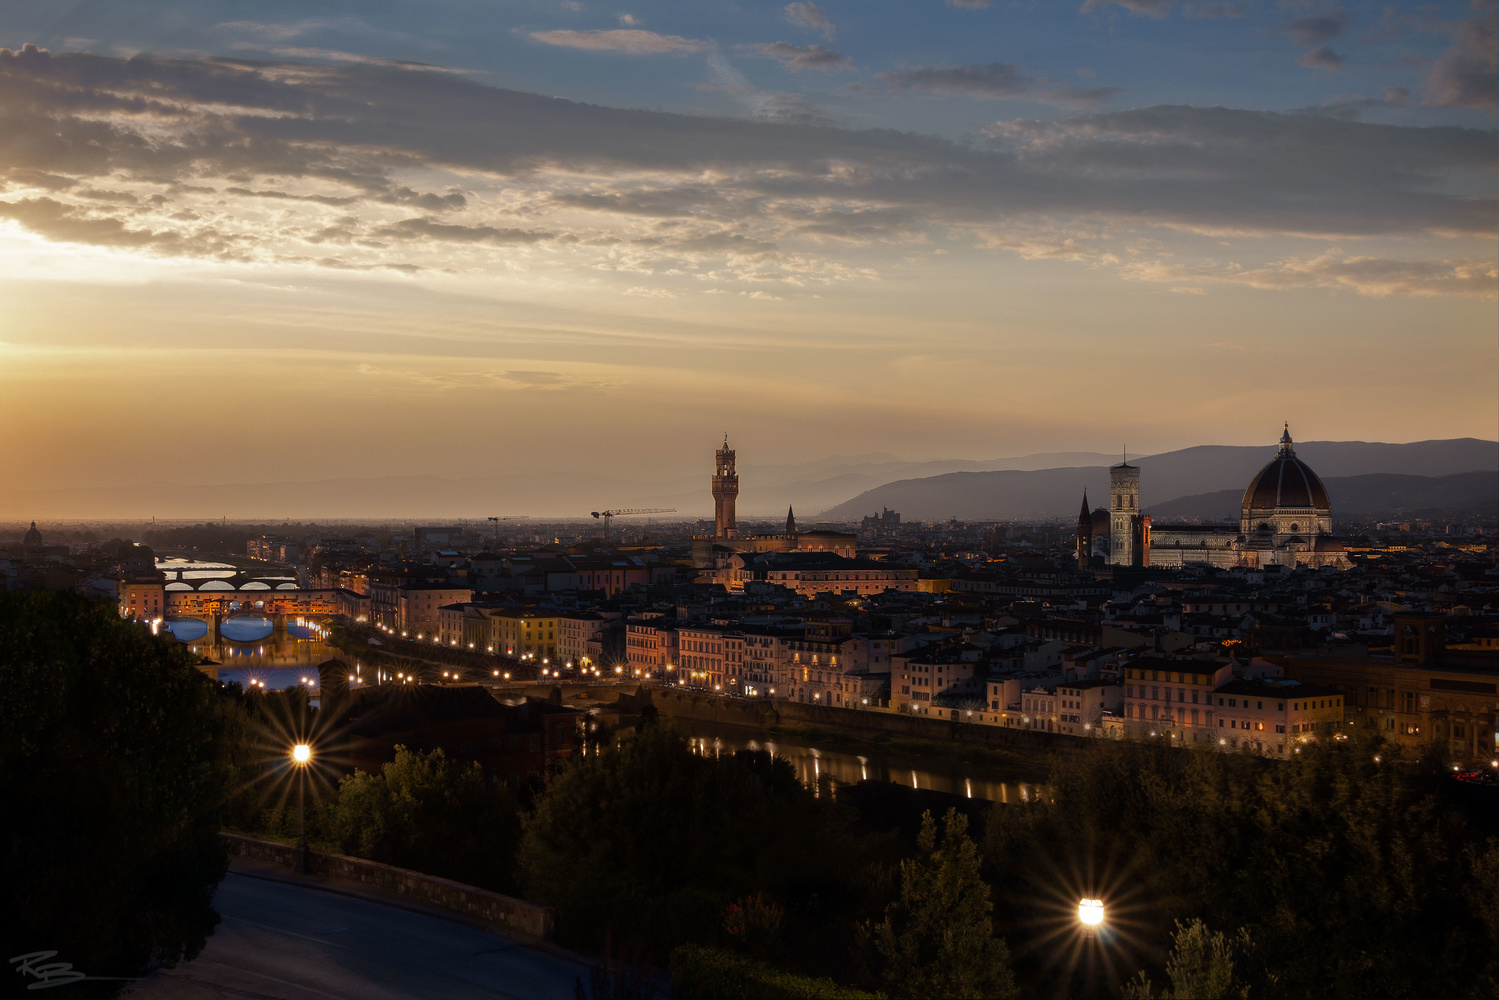 Twilight in Firenze by Roberto Benis